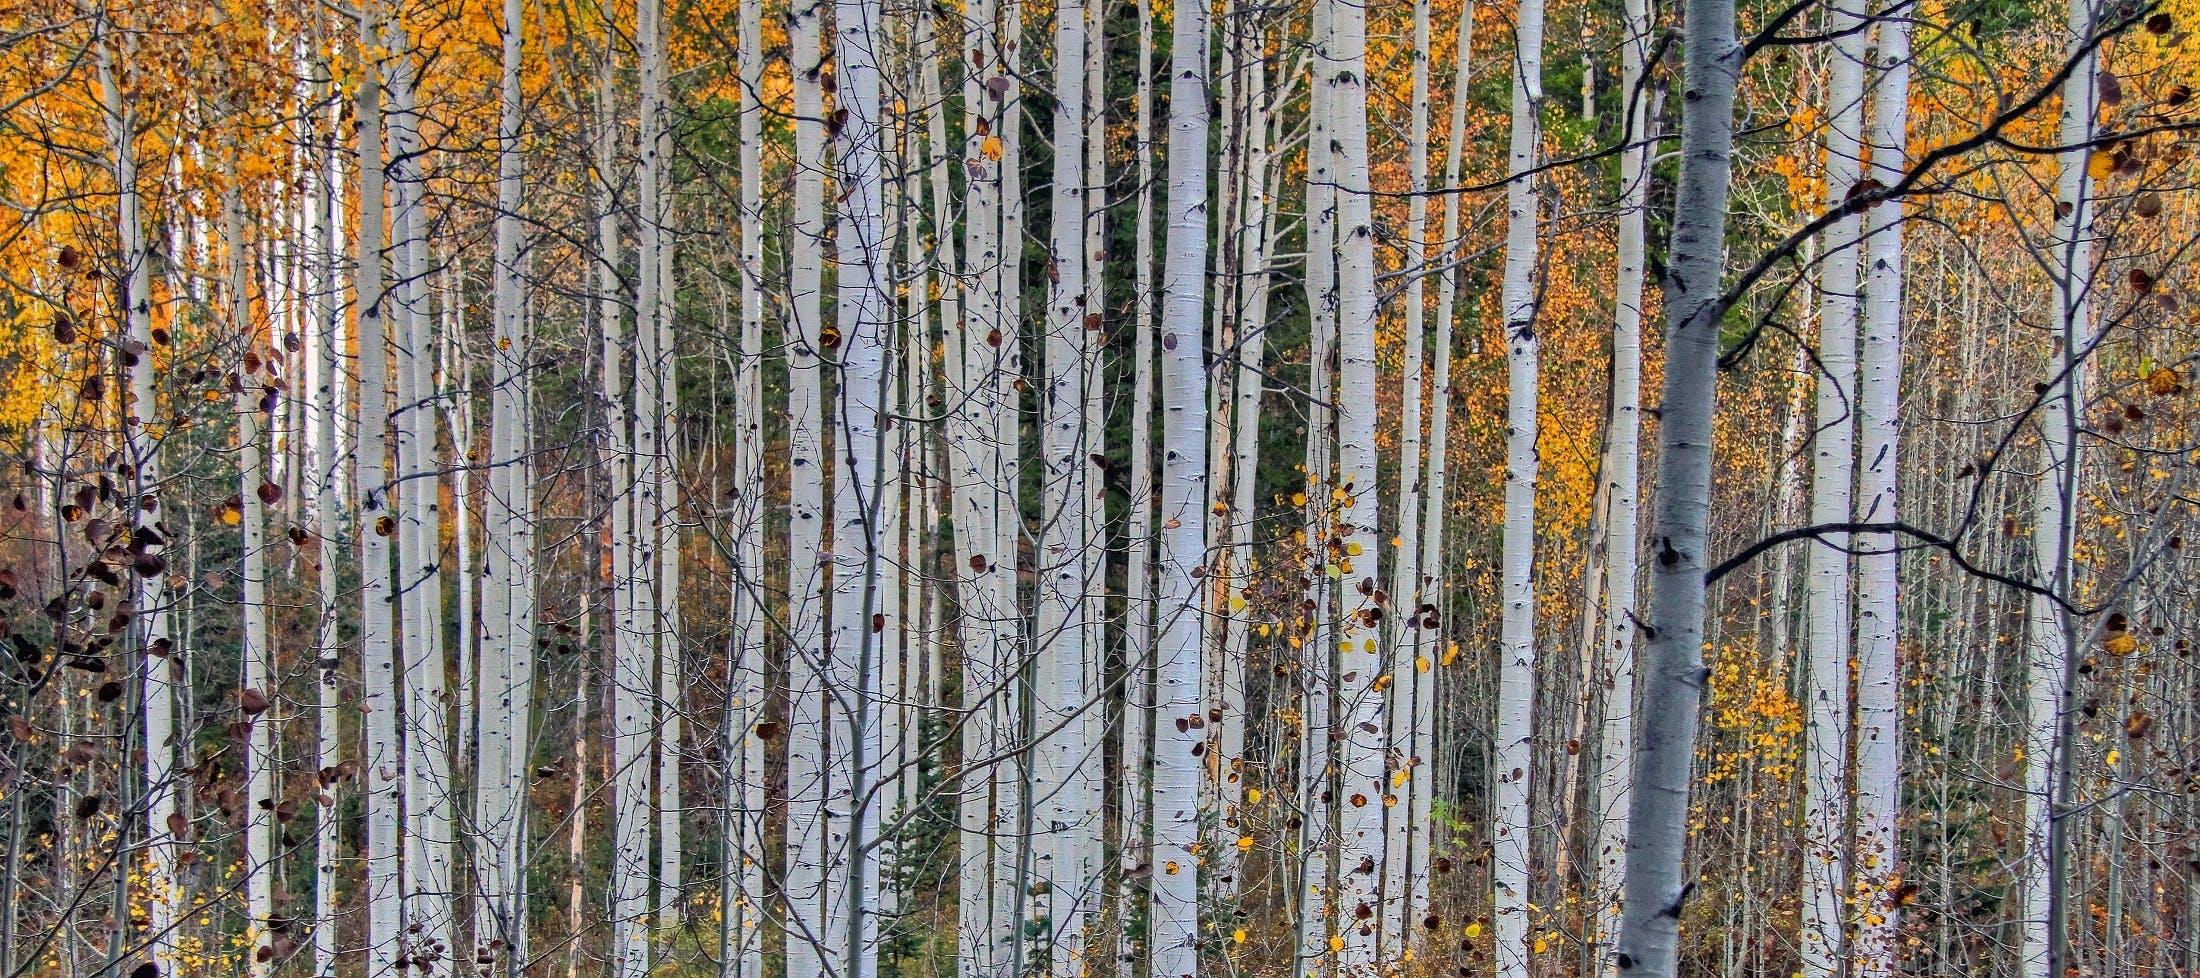 Kostenloses Stock Foto zu natur, badehose, wald, bäume